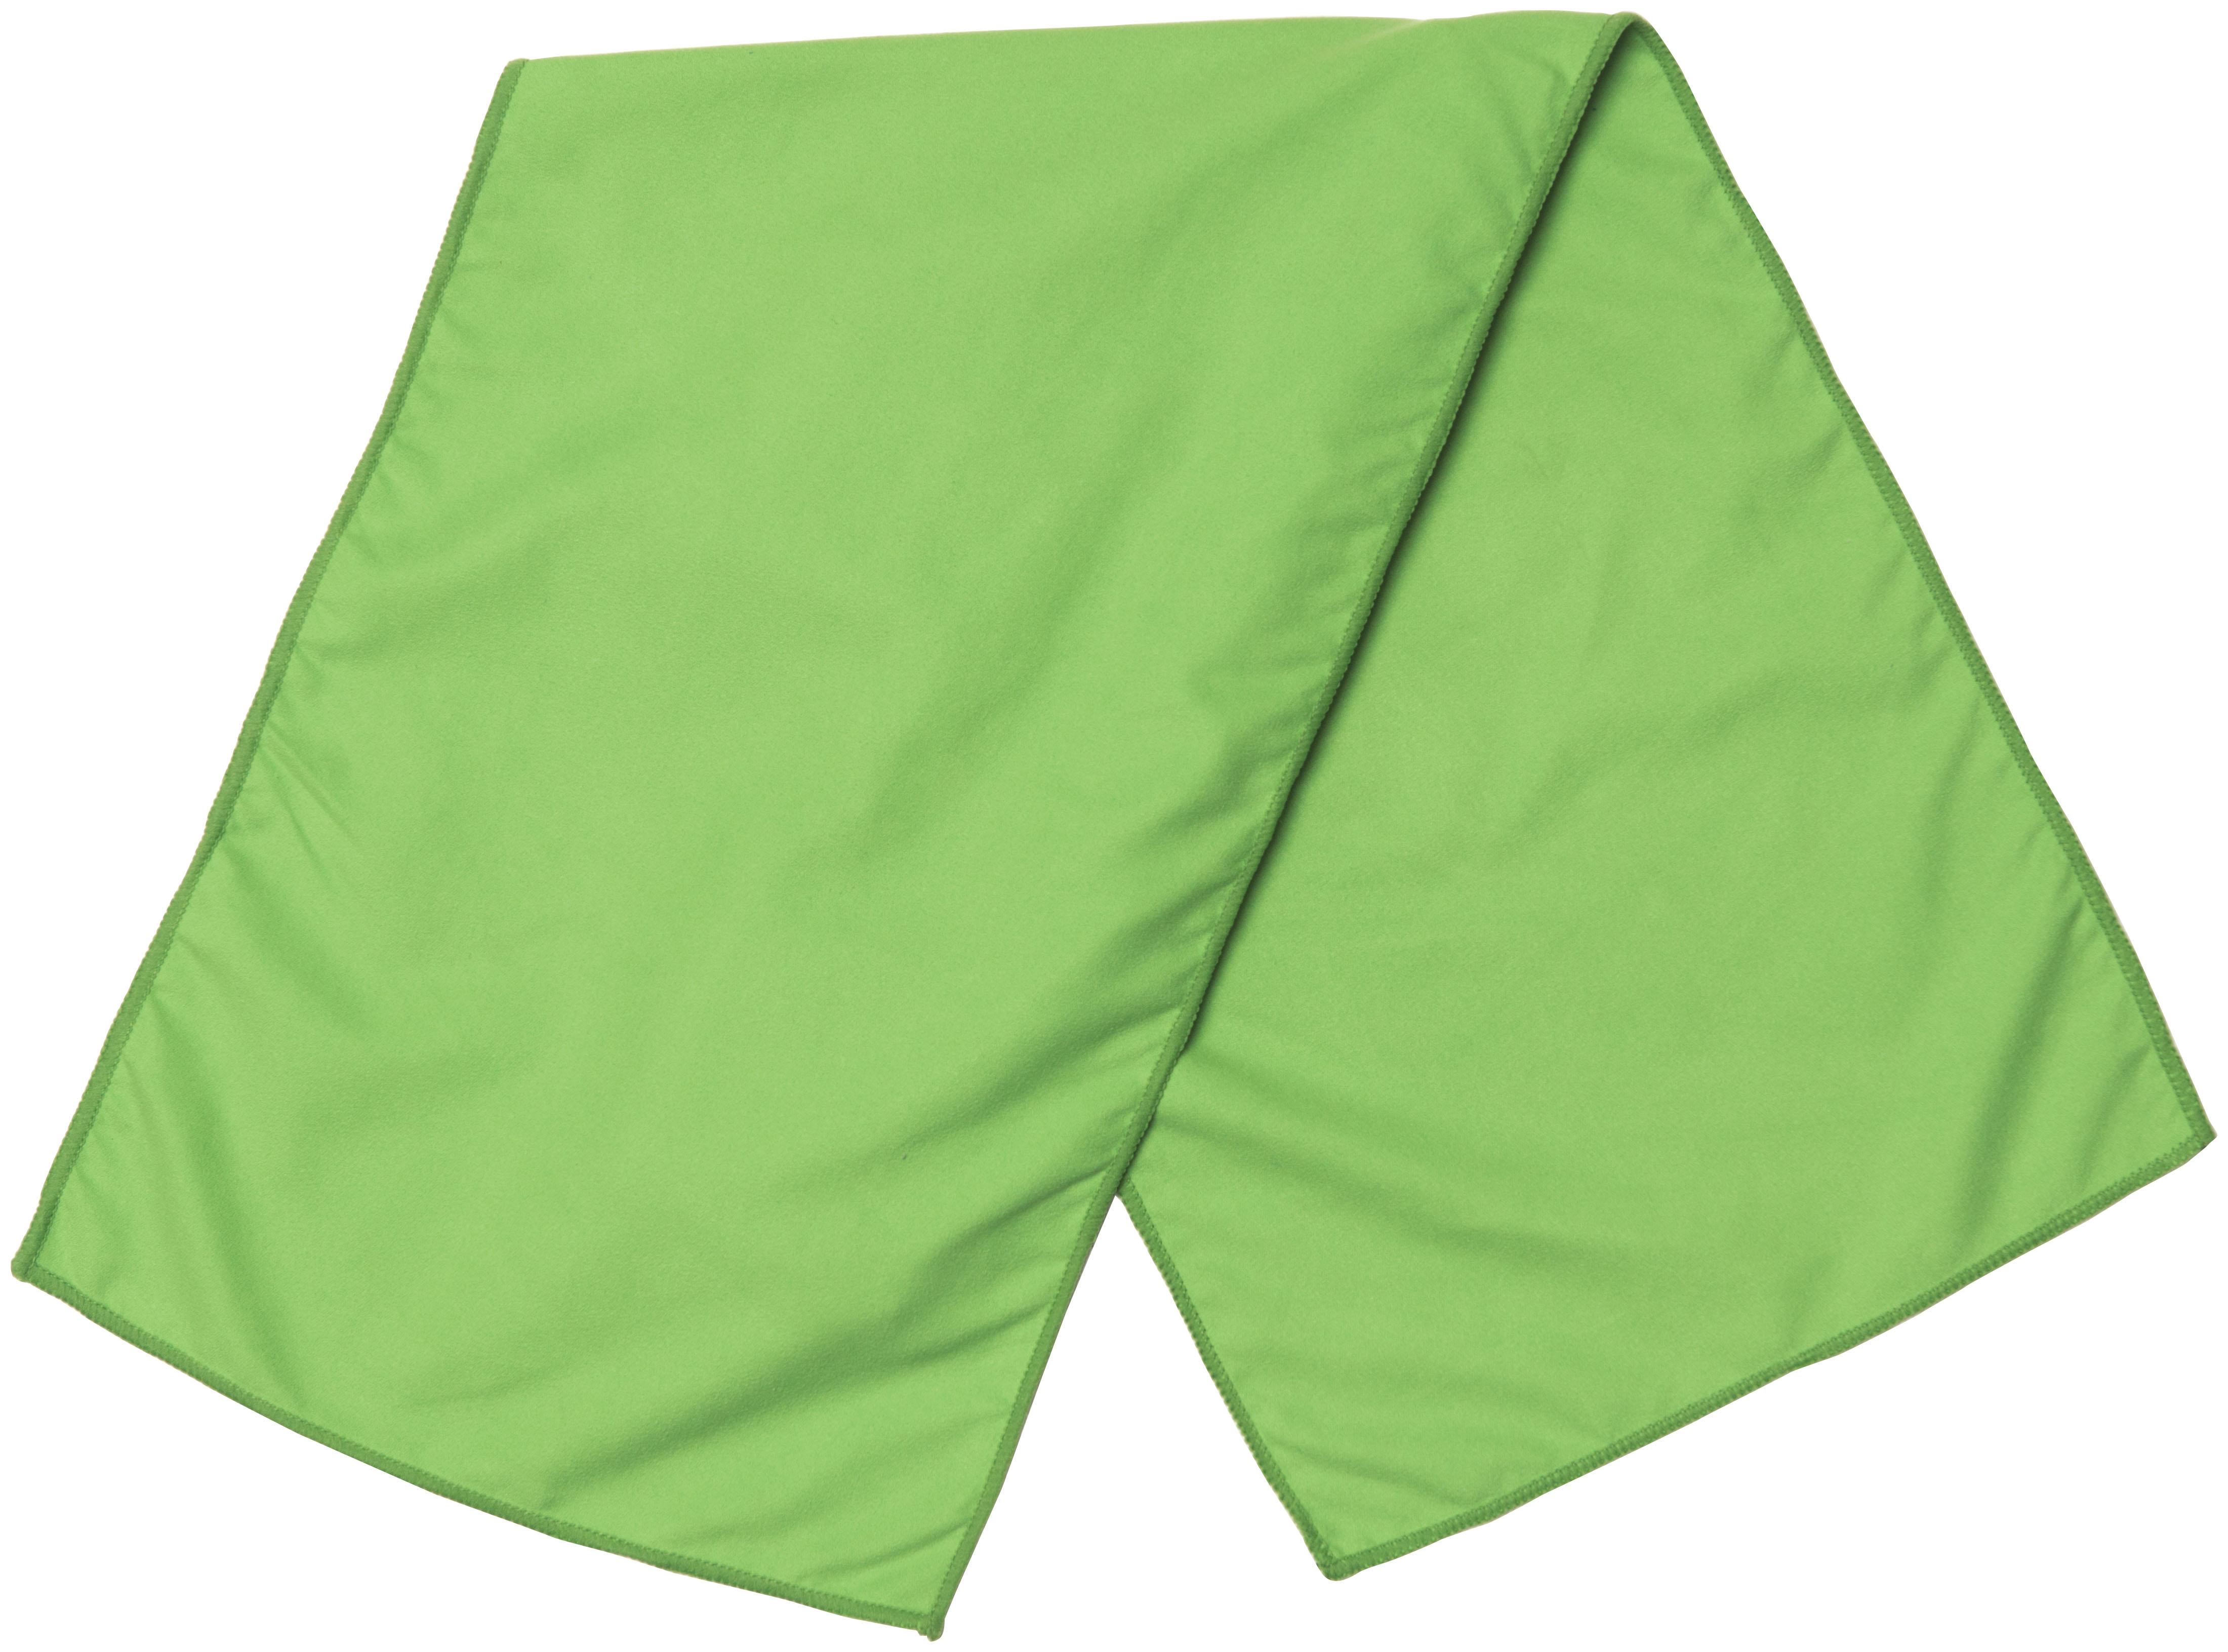 Frigitowel-Large-Green-A